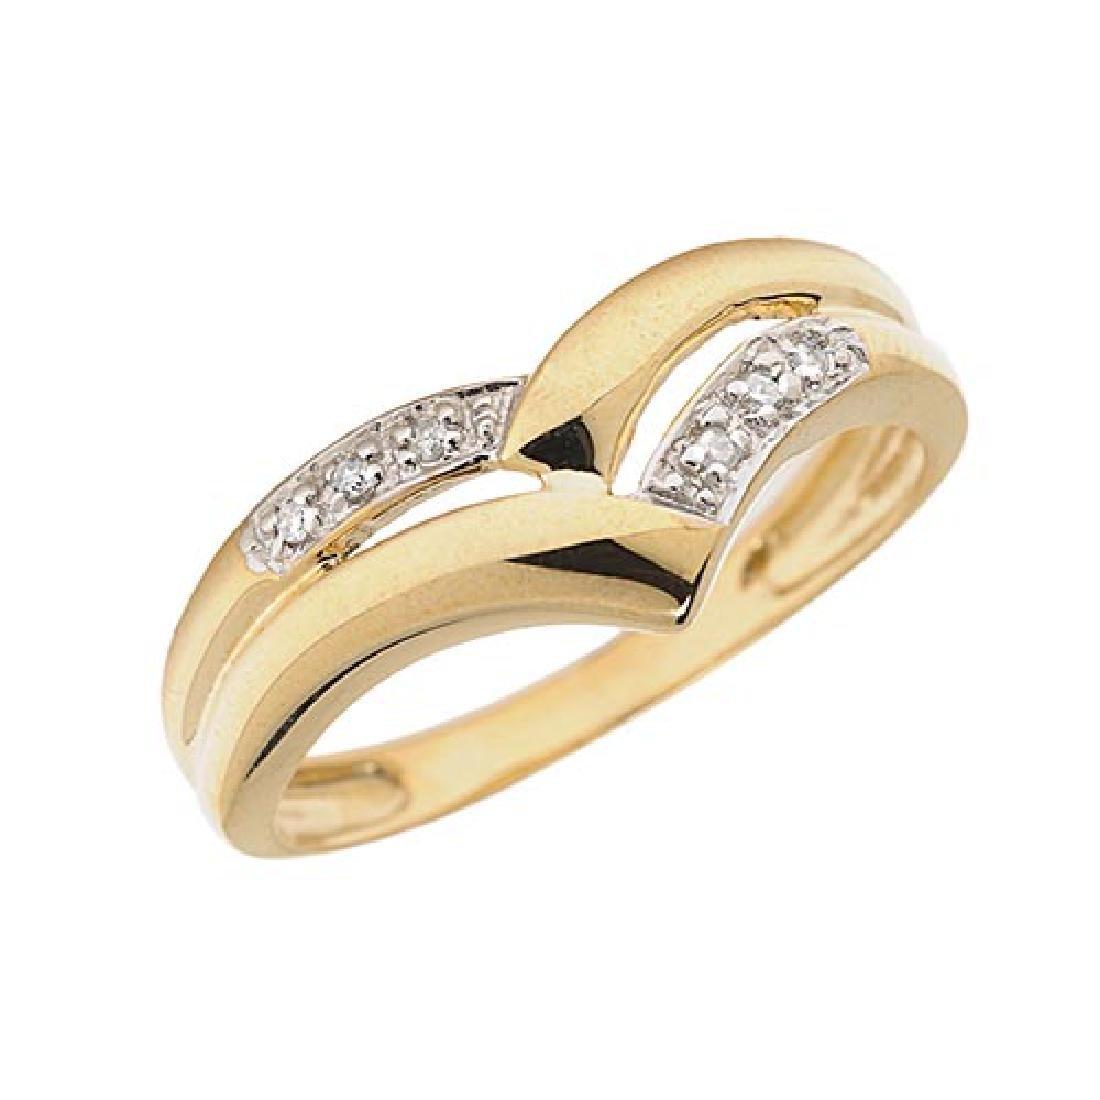 Certified 14K Yellow Gold Diamond Chevron Ring